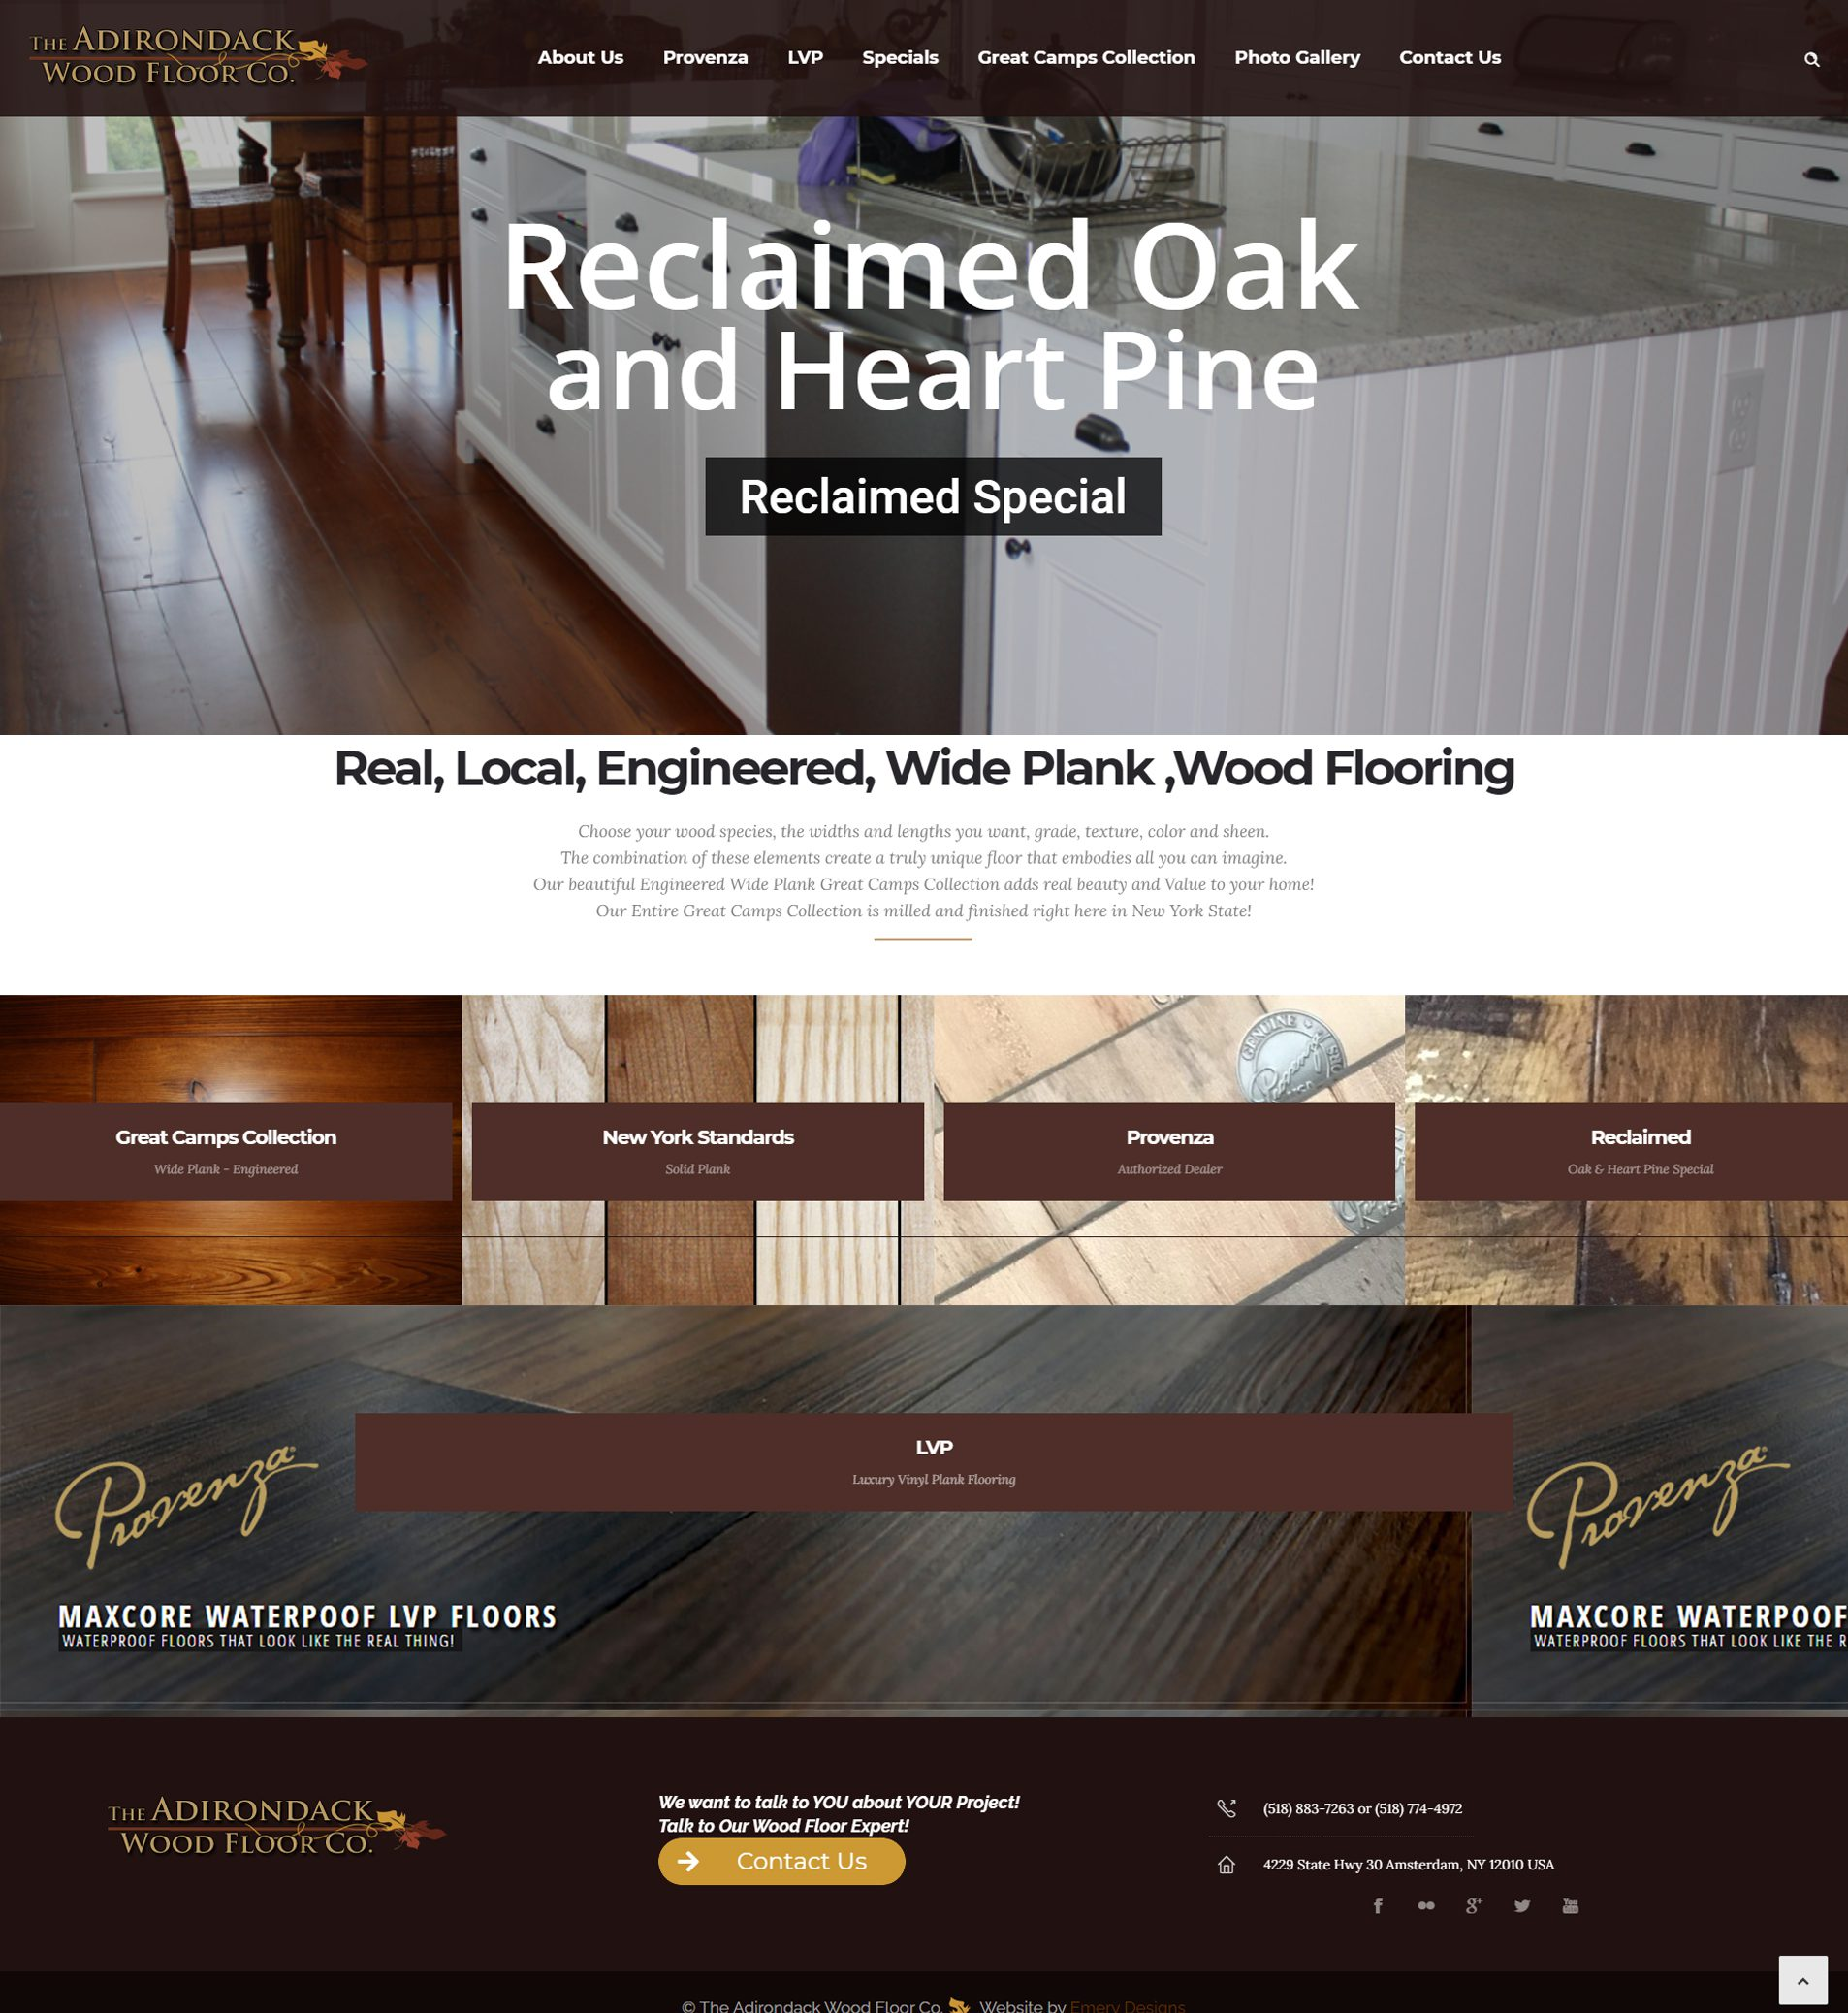 Adirondack Wood Floor Co.